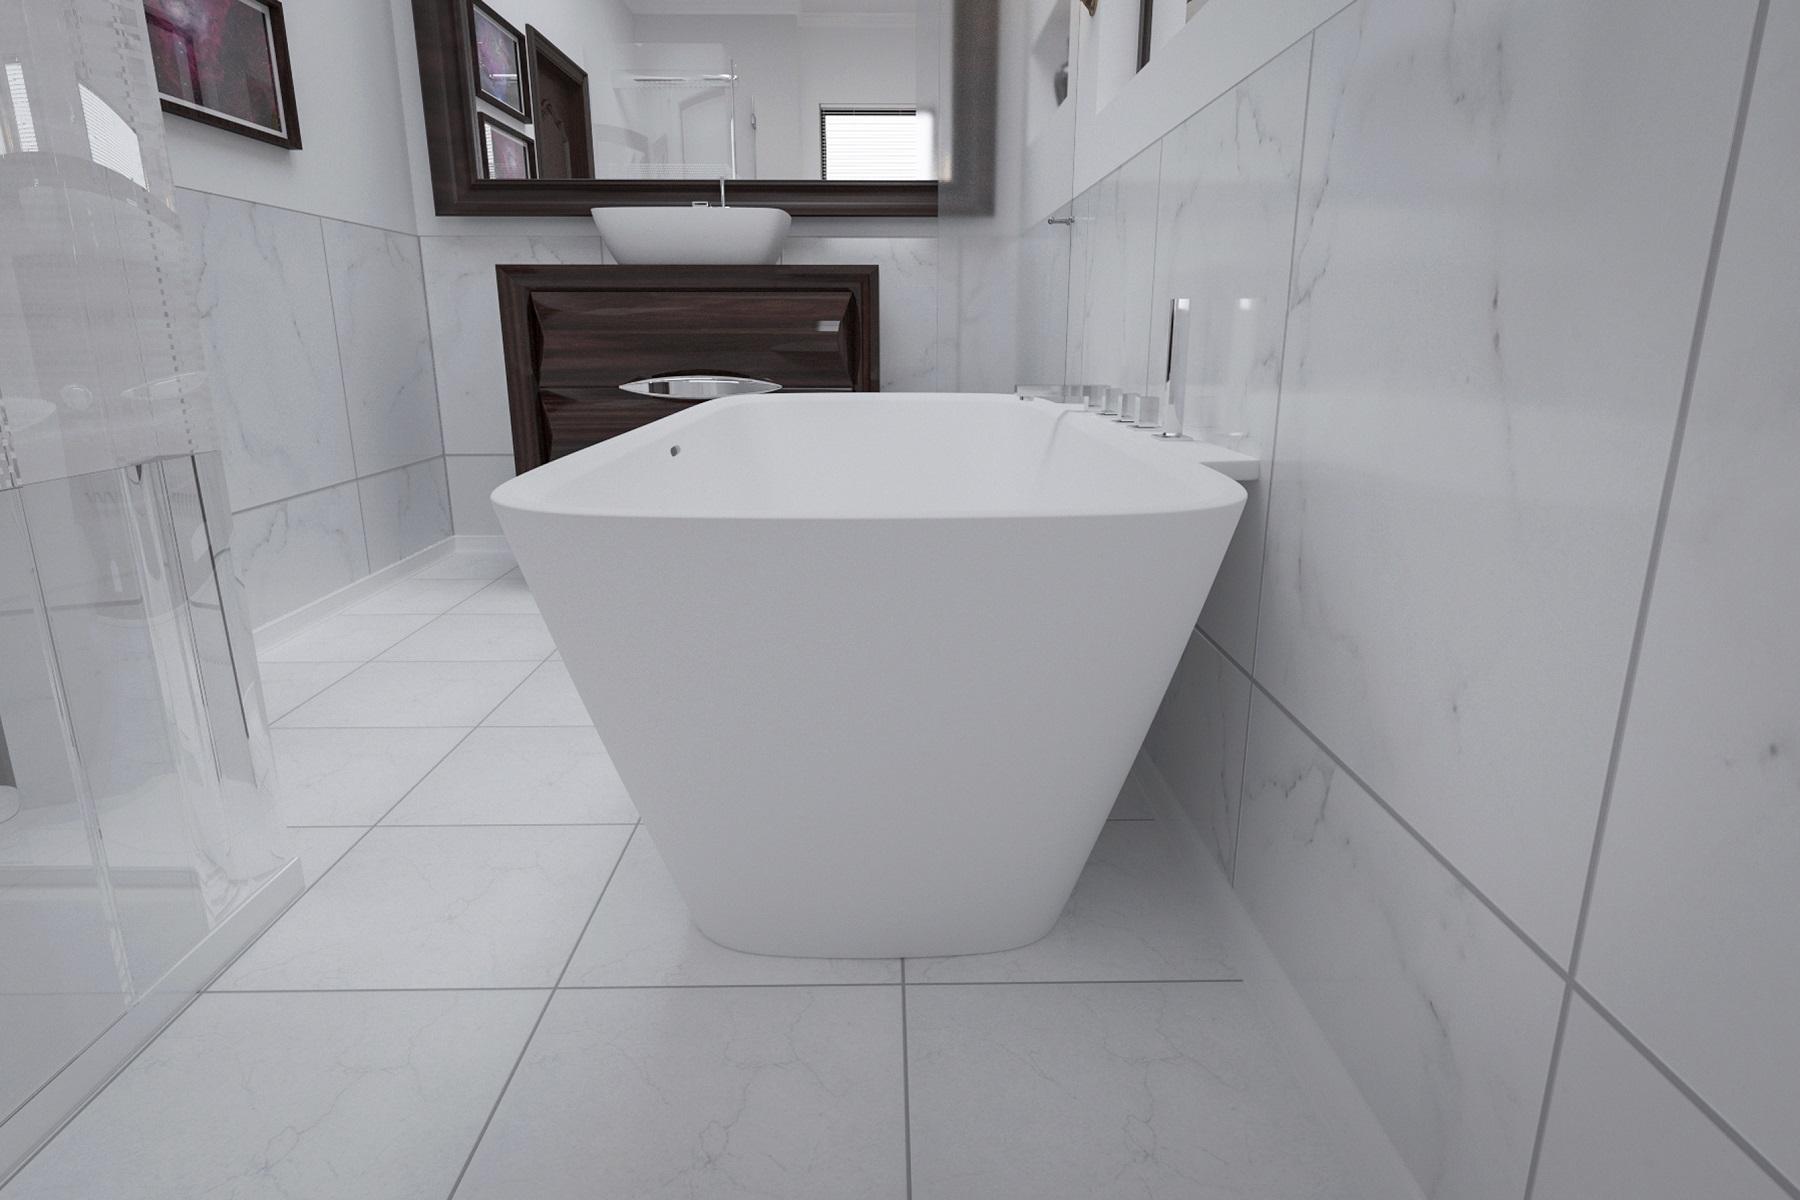 aquatica arabella wall baignoire contre le mur surface solide. Black Bedroom Furniture Sets. Home Design Ideas